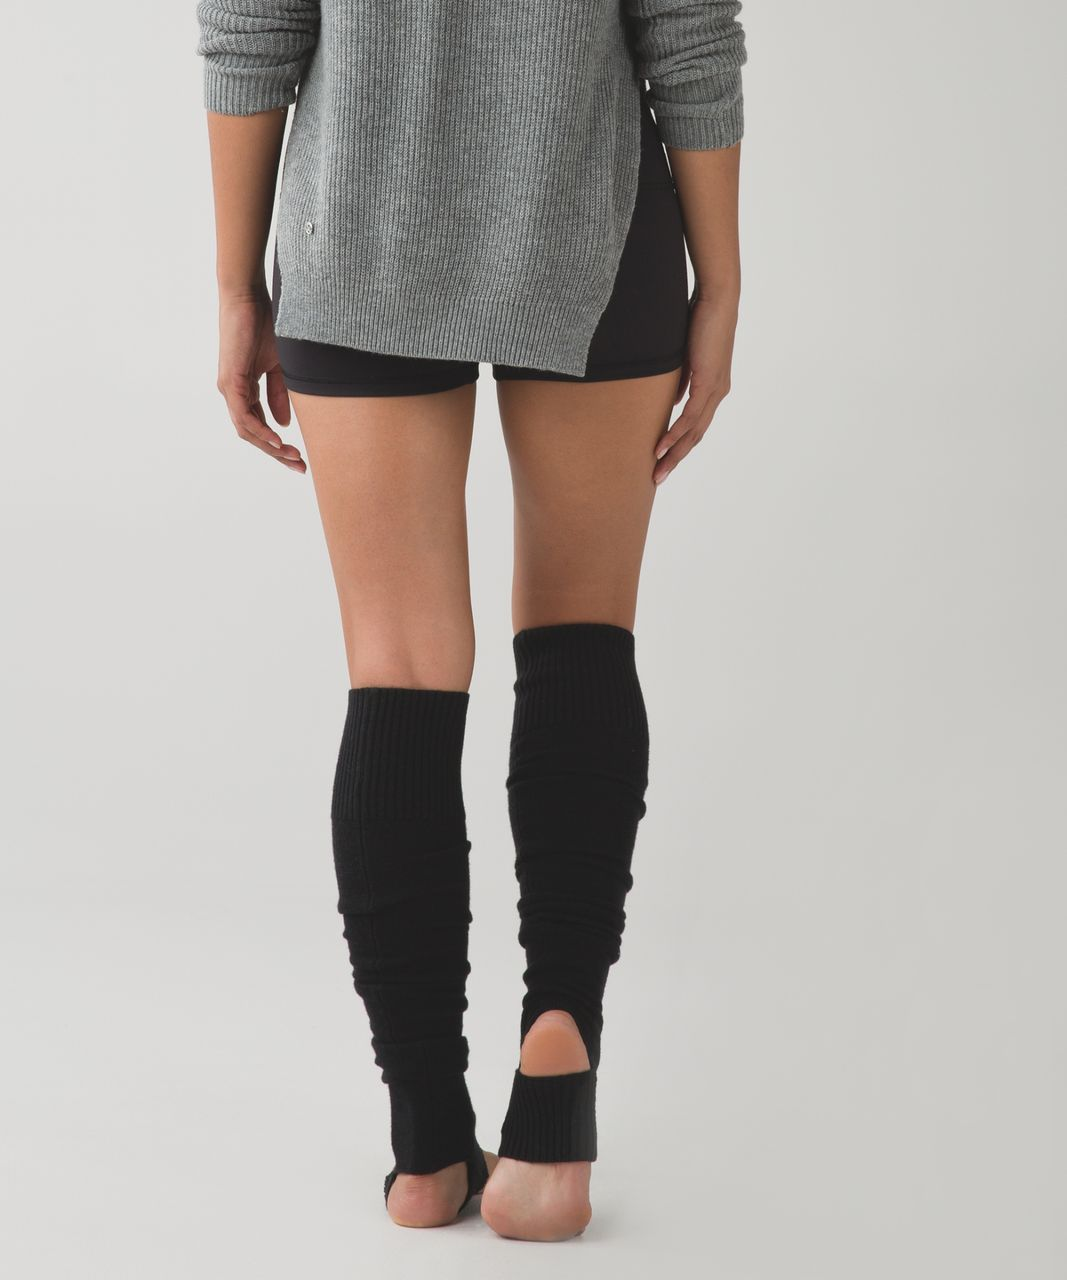 Lululemon Evolution Leg Warmers - Black